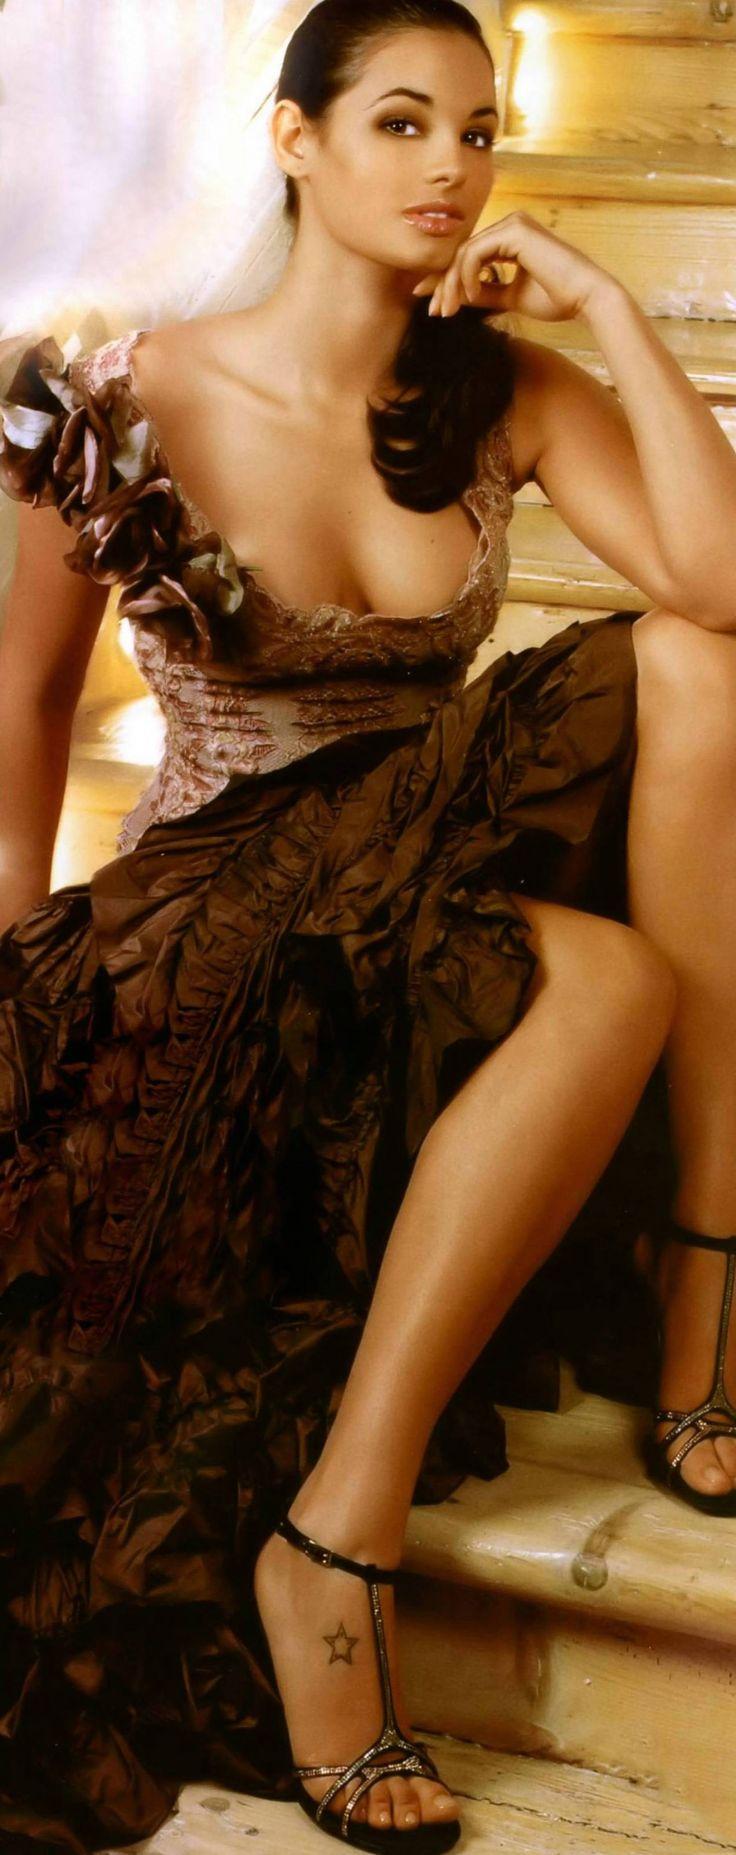 image Francesca hot italian girl with big natural tits gets naked and masturbate